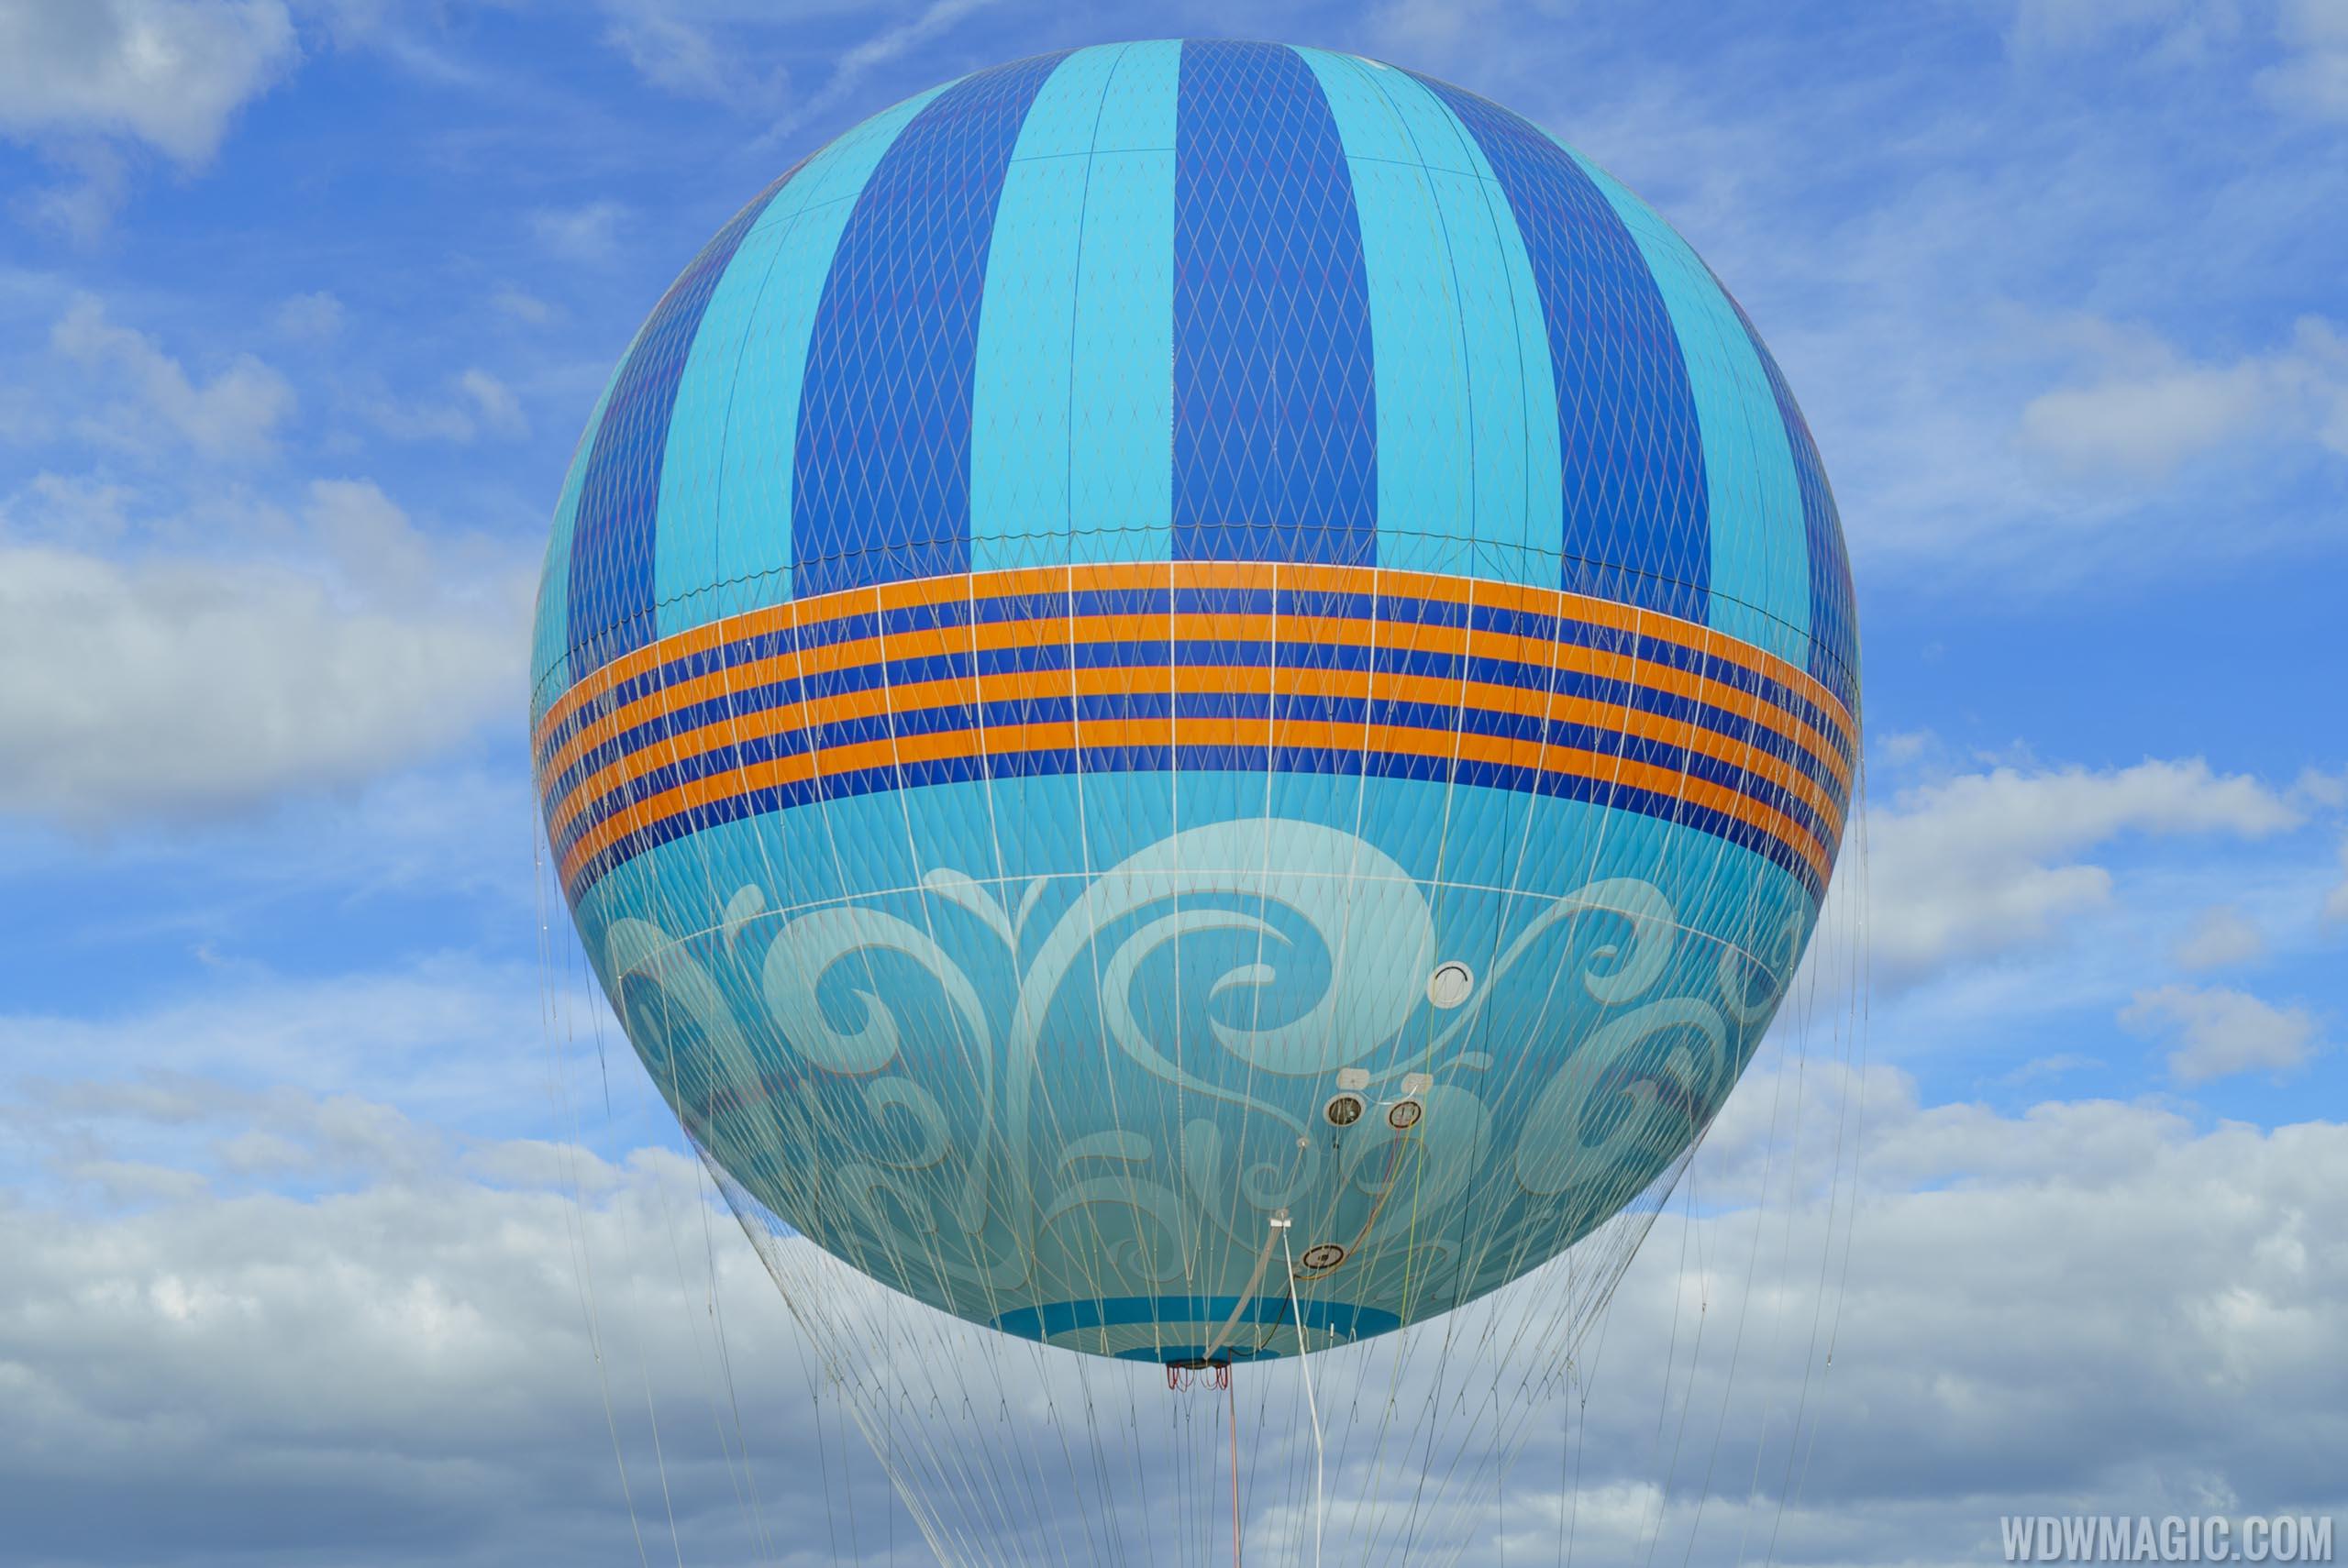 New look Characters in Flight balloon